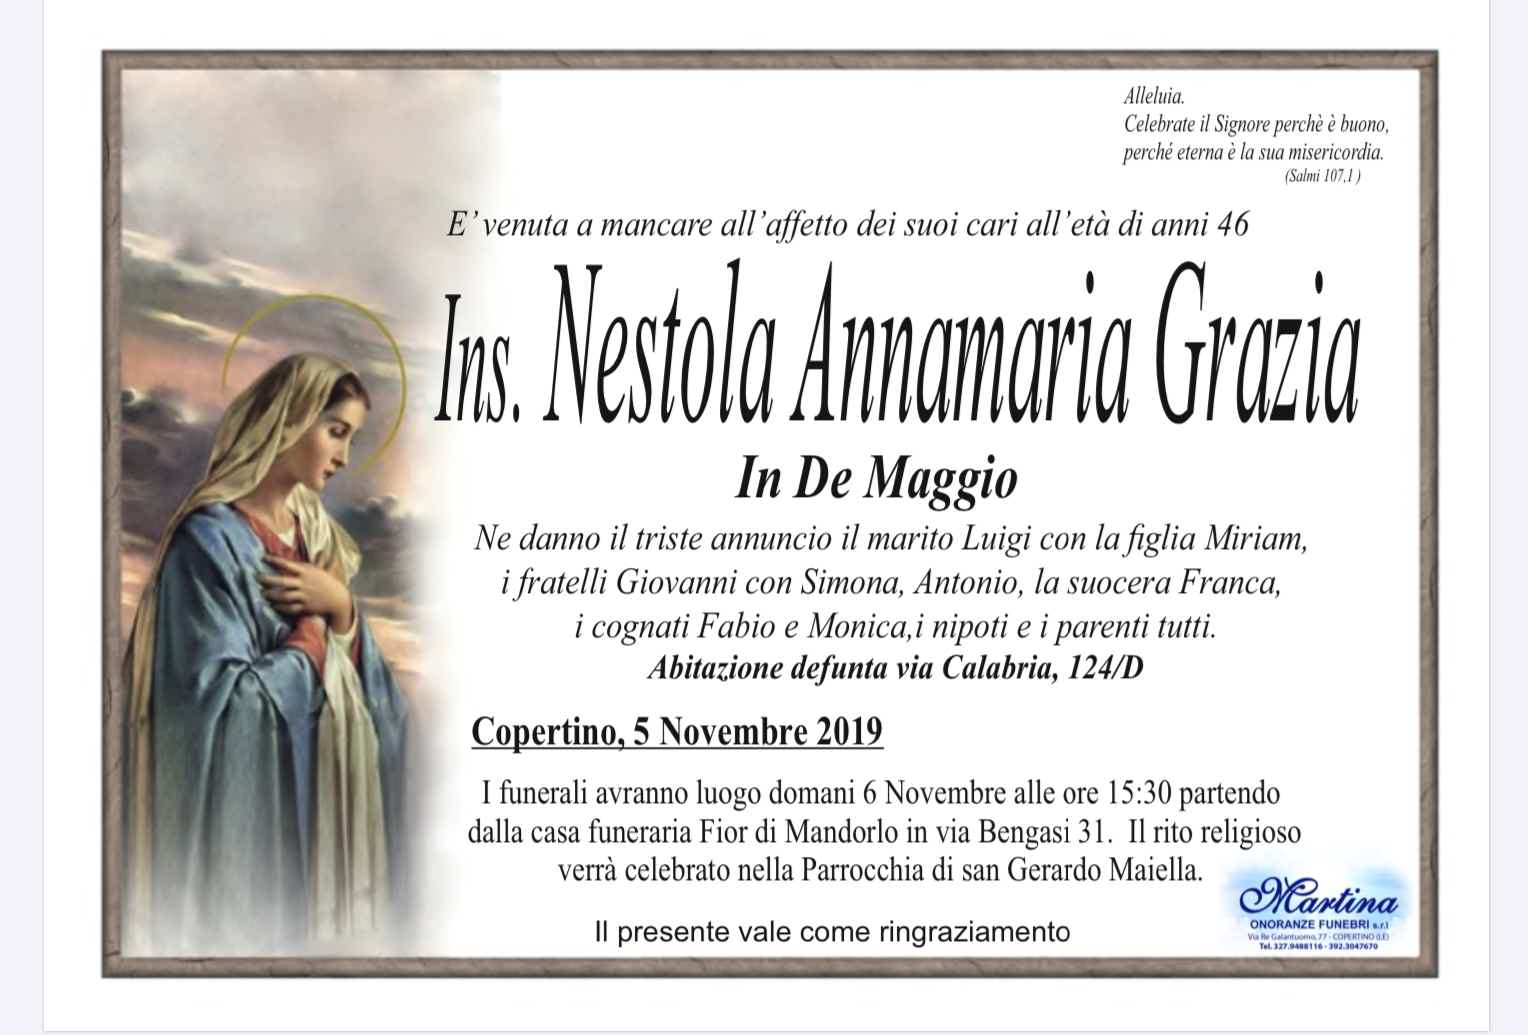 Annamaria Grazia Nestola